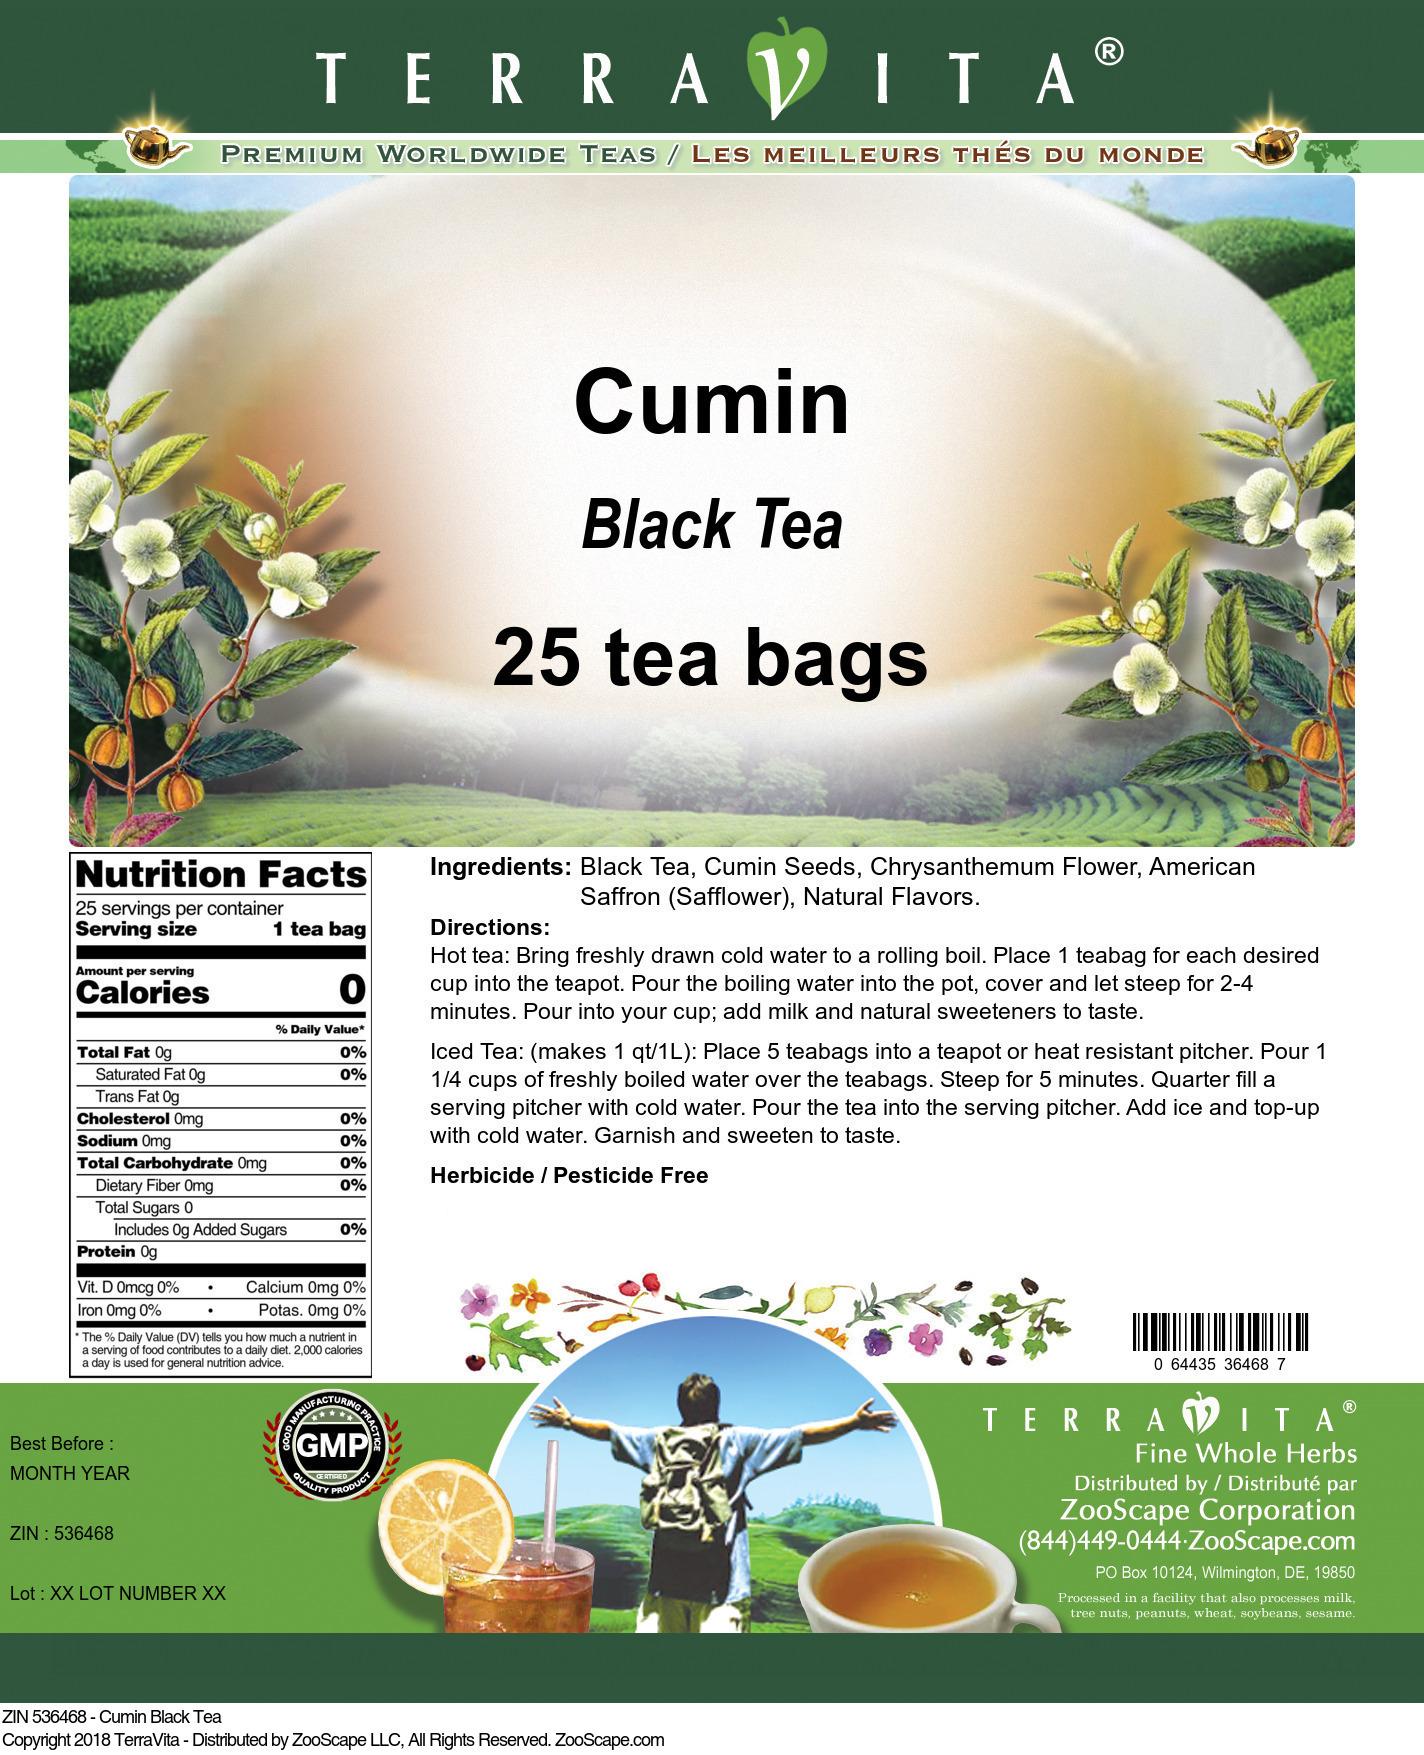 Cumin Black Tea